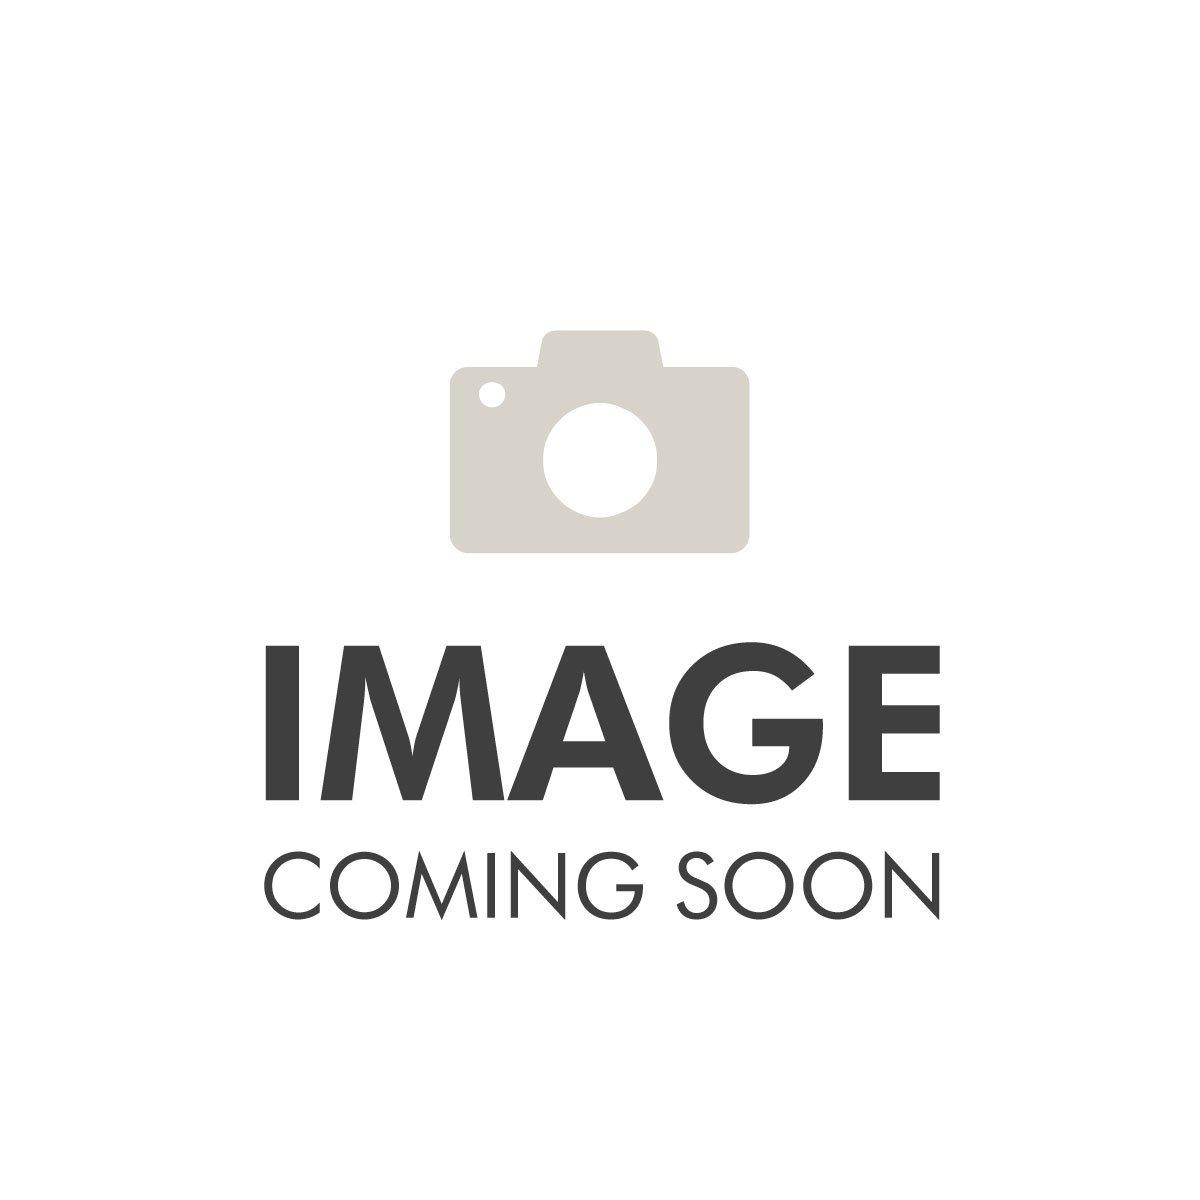 L'Oreal Loreal Wild Stylers Crêpage De CHignon Mineral Powder Fixing Spray 200ml